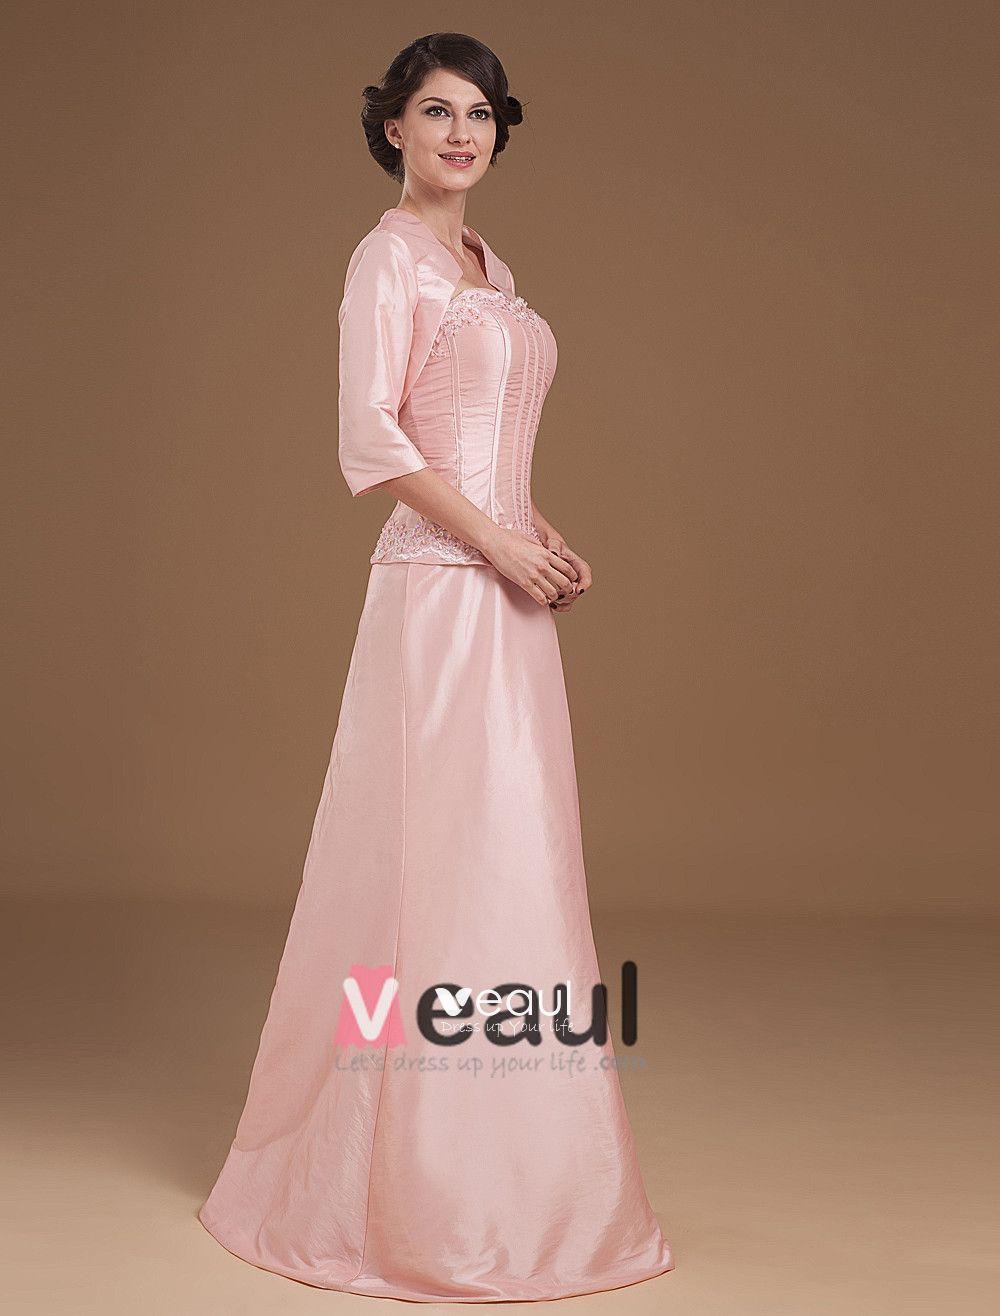 Taffeta Satin Sweetheart Beads Floor Length Mothers of Bride Guests Dresses